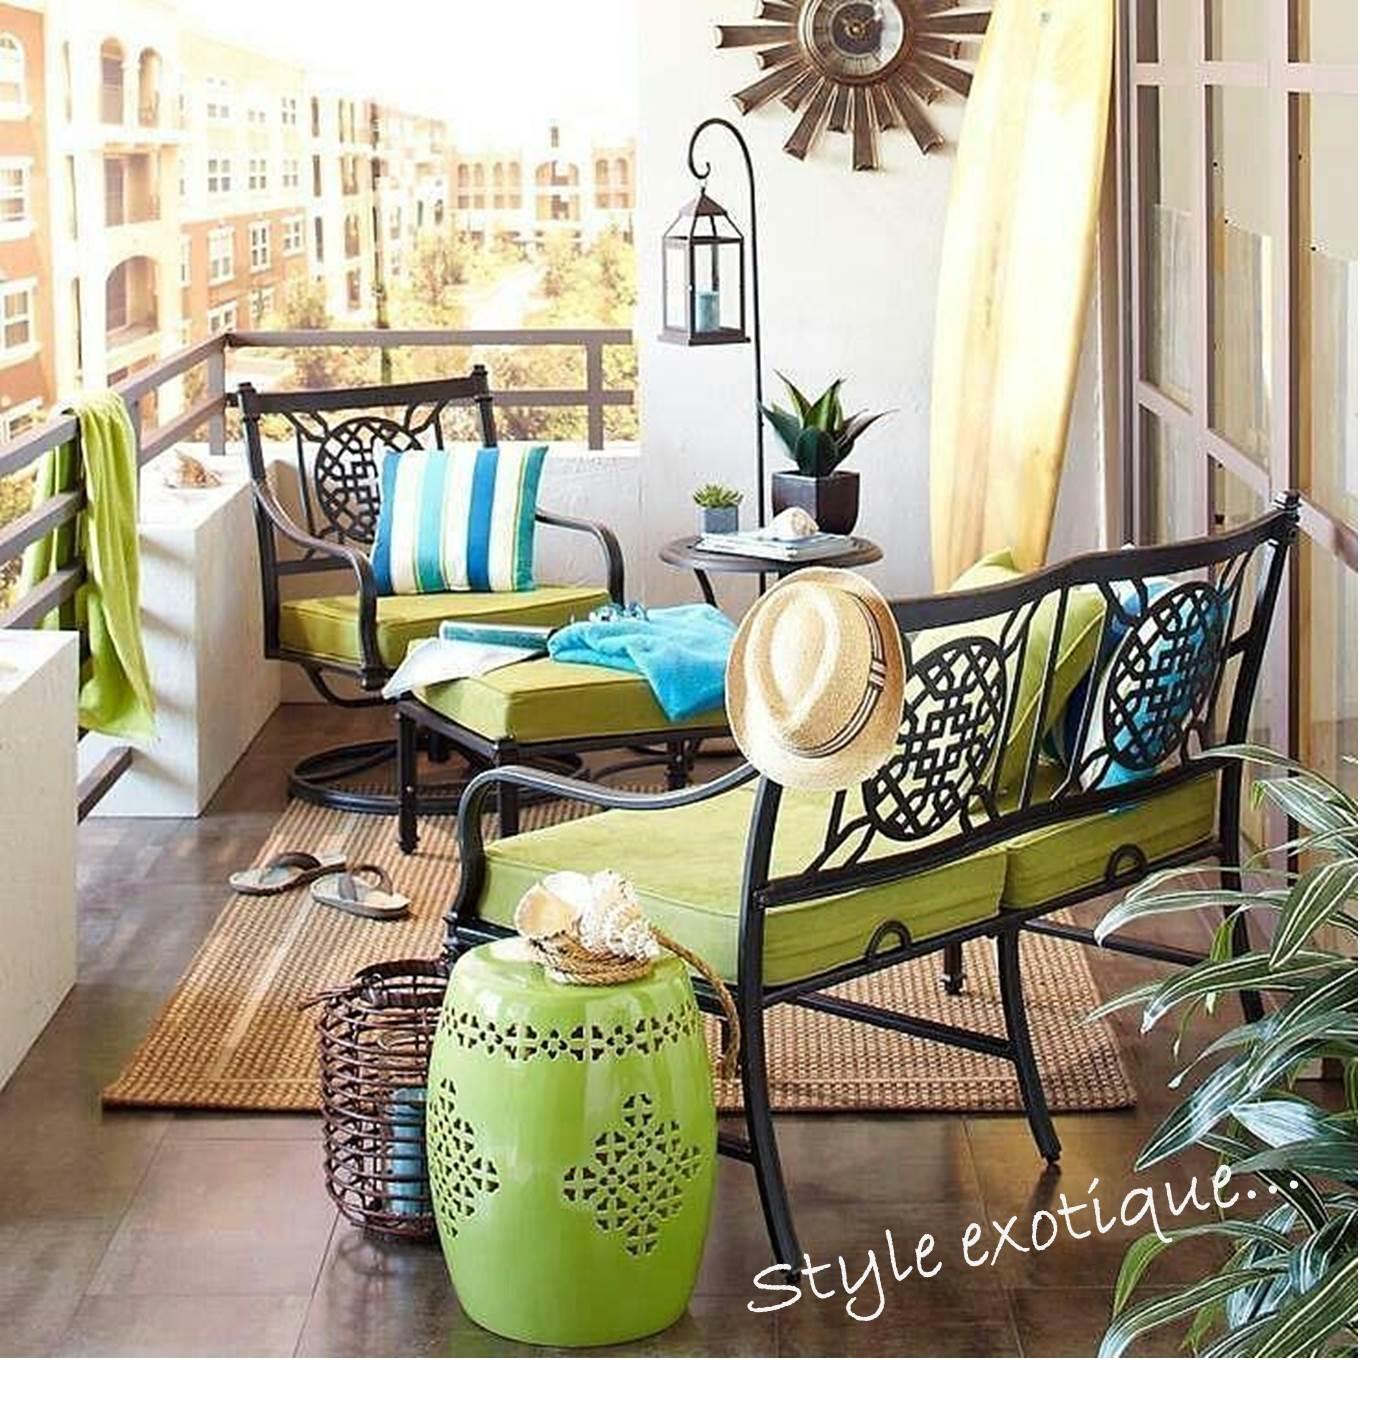 Deco Chambre Style Exotique balcon style exotique estelle jubelin decoratrice reims